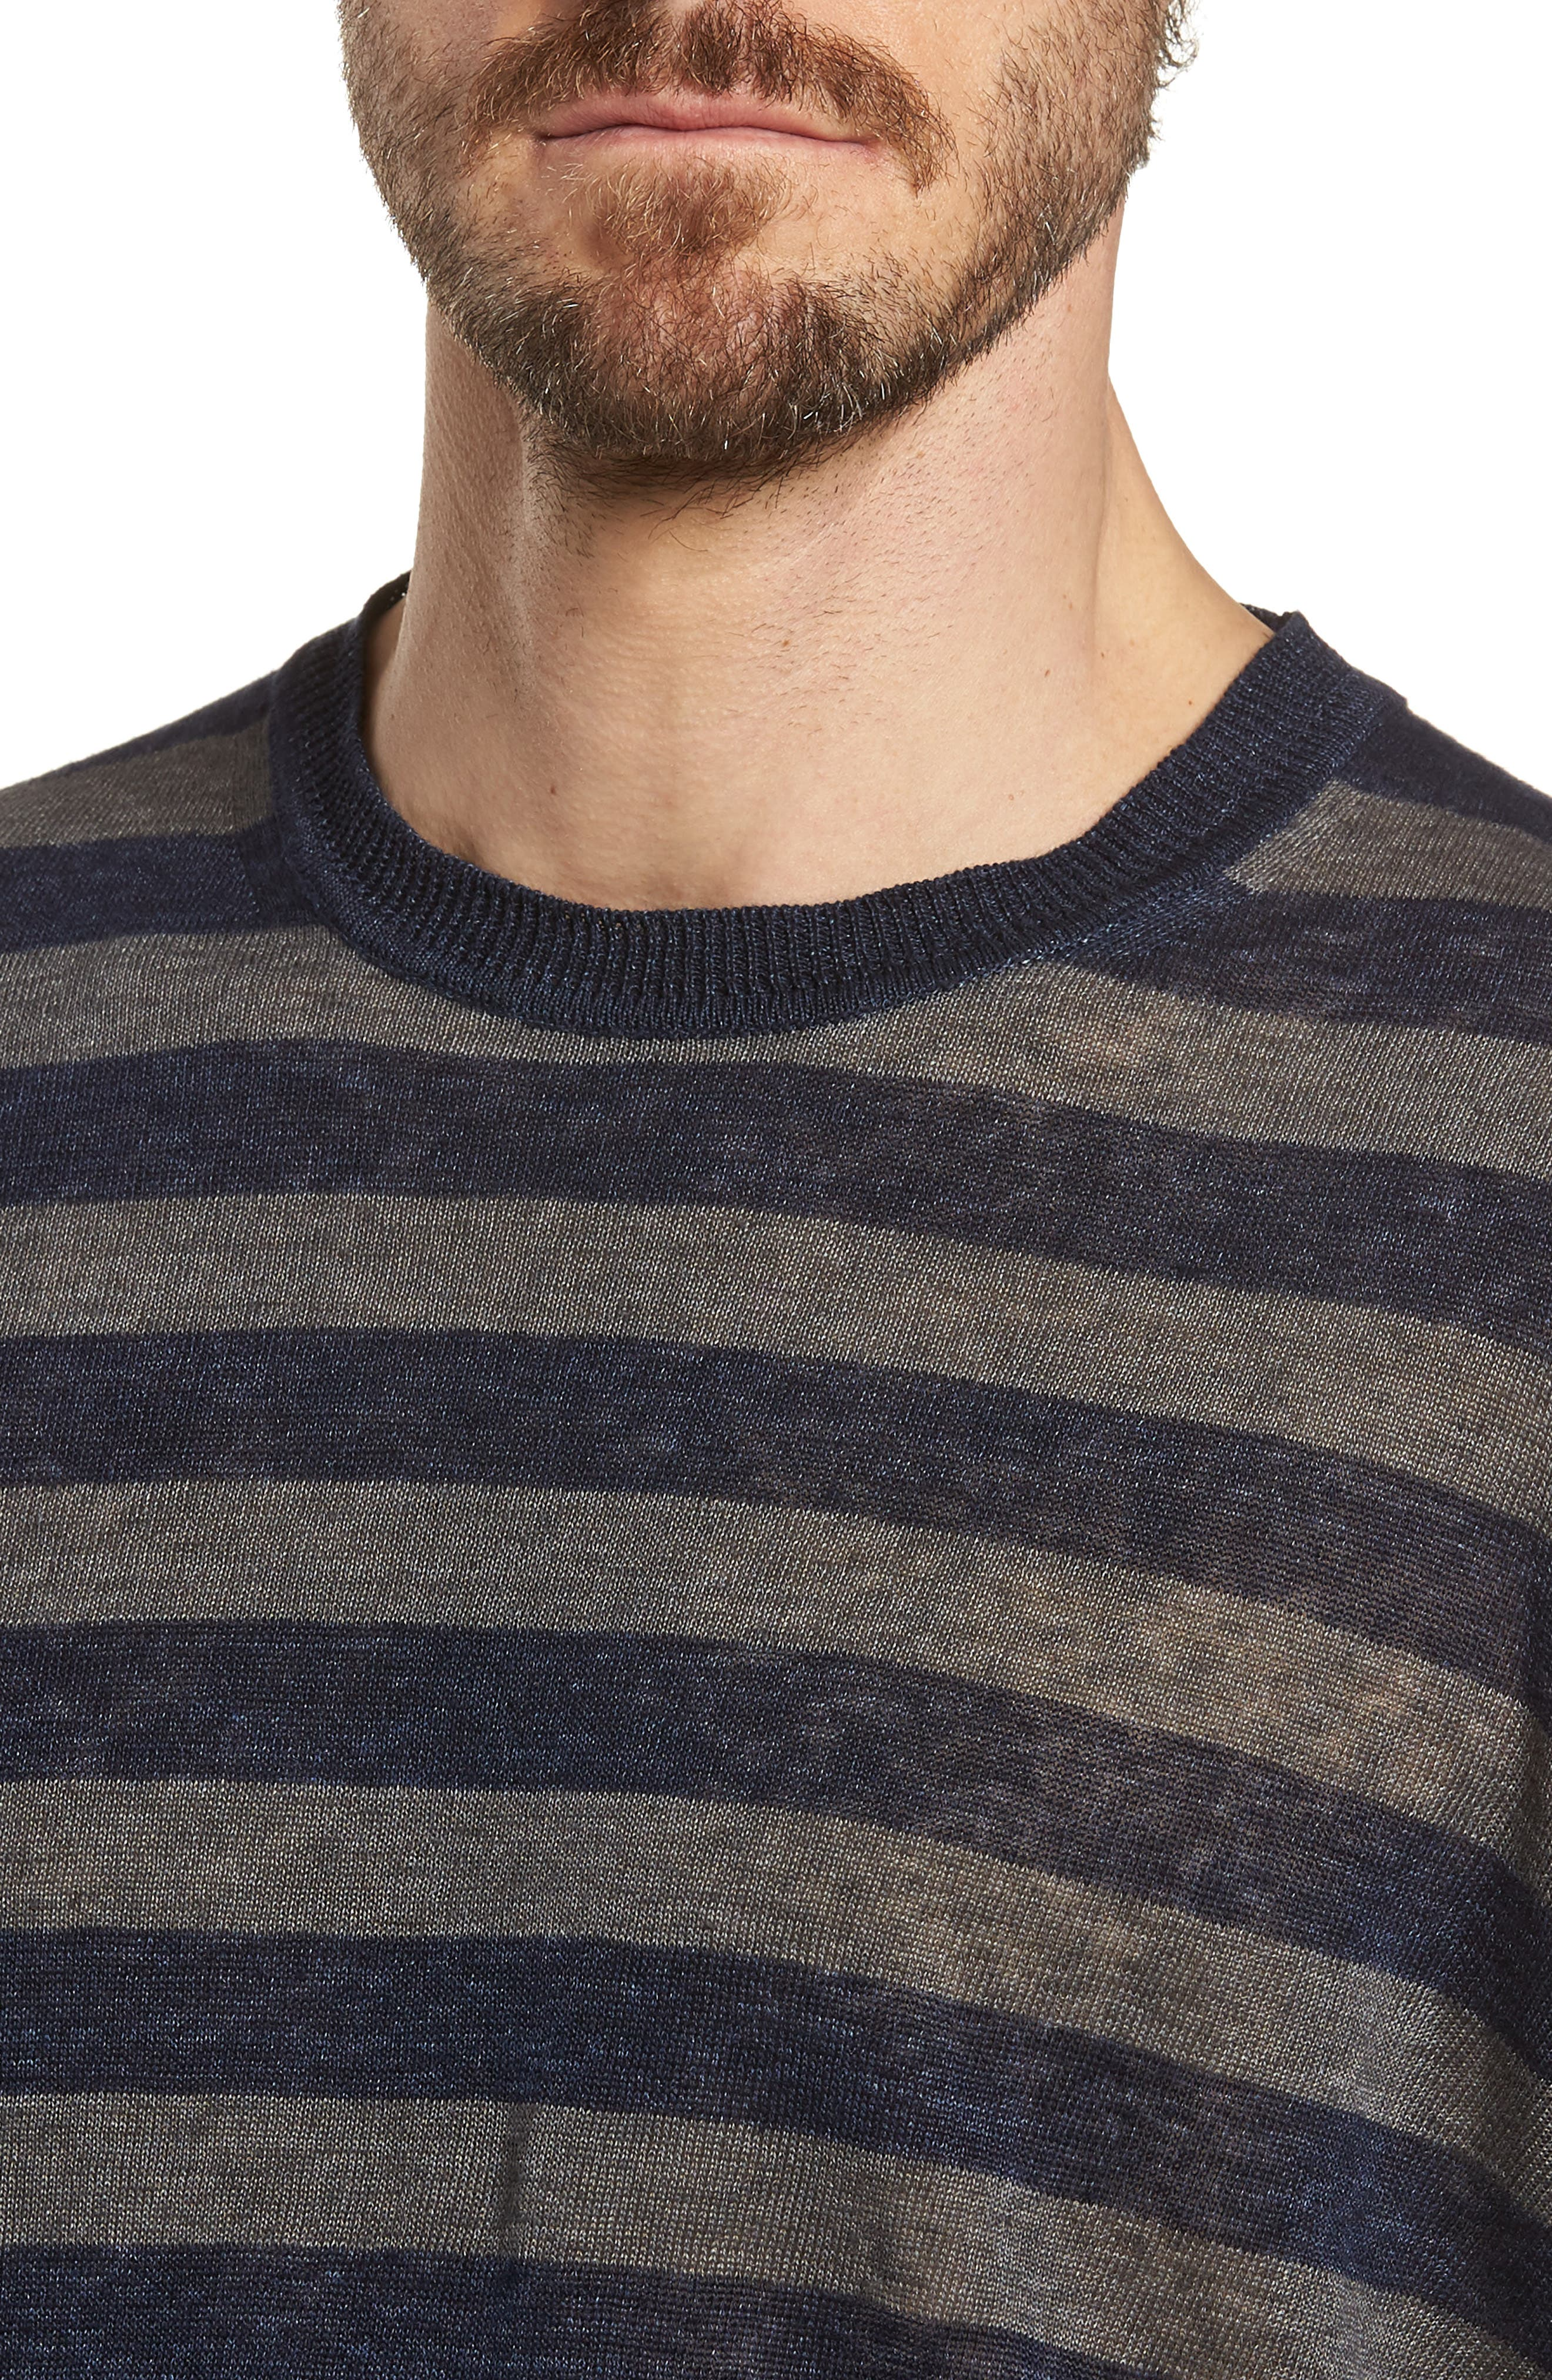 & Bros. Stripe Linen Sweater,                             Alternate thumbnail 4, color,                             Navy Stripe